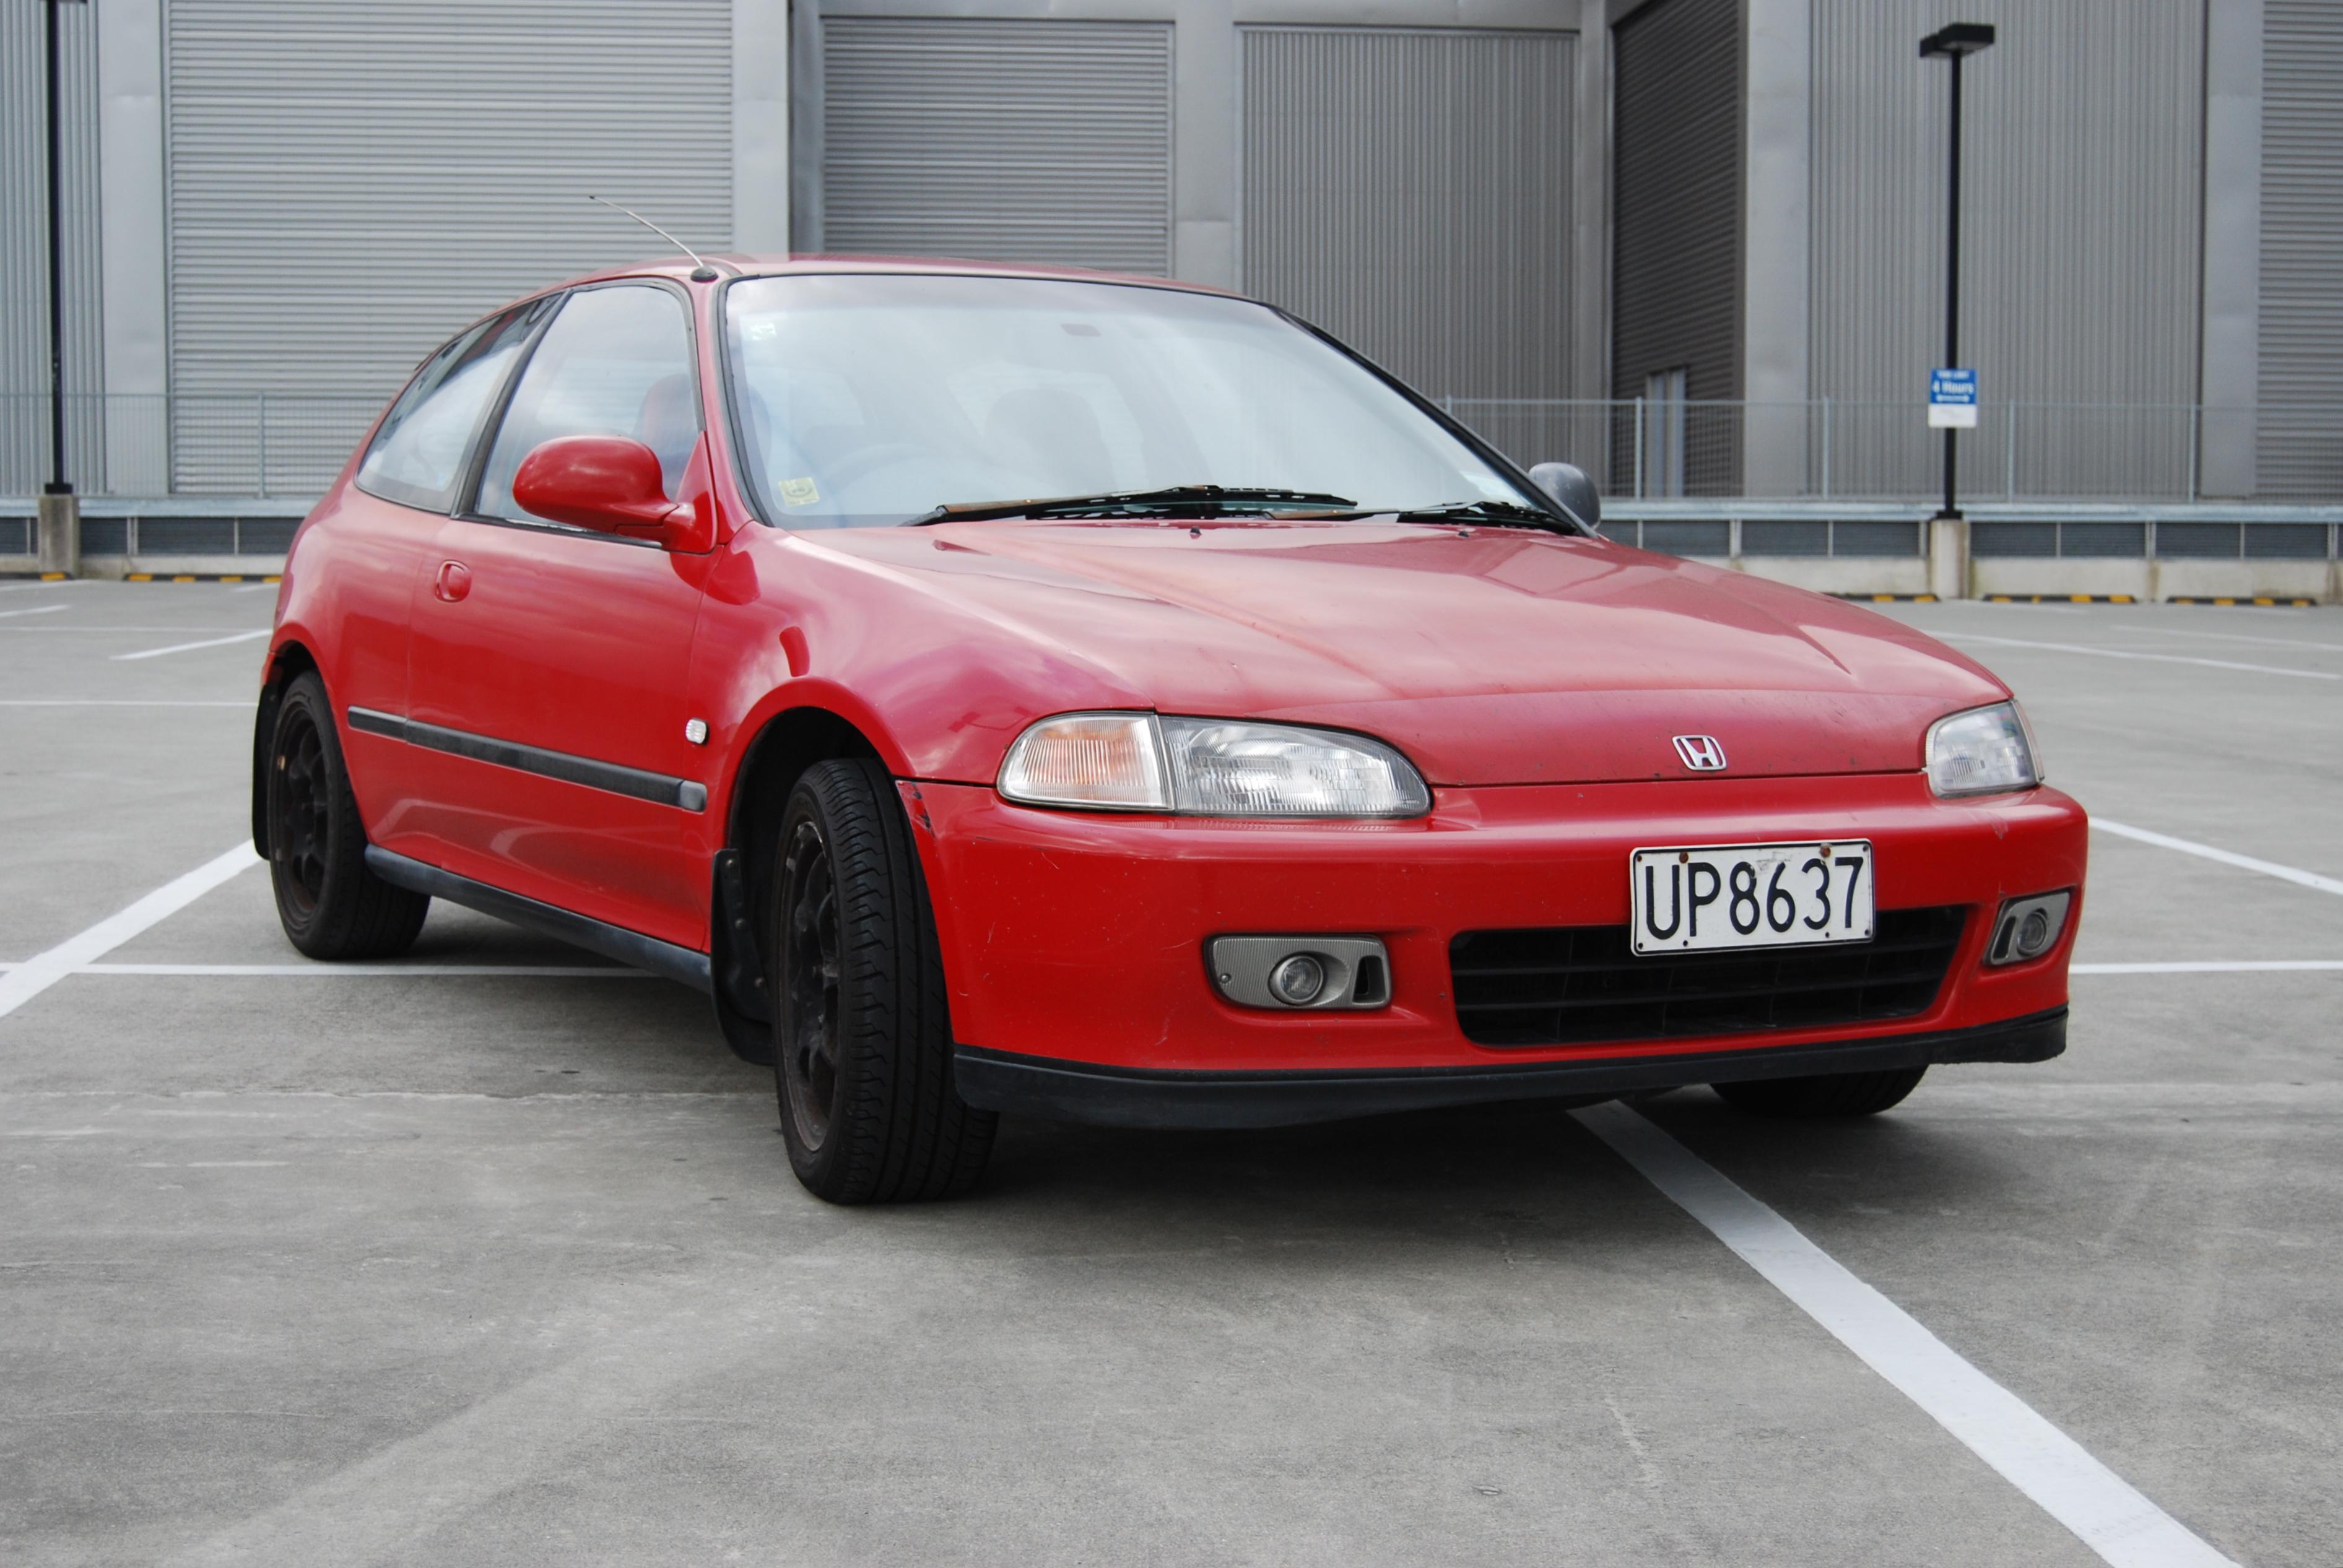 File:Honda Civic GTi 1994 red.jpg - Wikimedia Commons on 1994 toyota civic, jdm civic, white ej8 civic, b16 civic, turbocharged civic, h22 civic, b18c1 civic, concave rims civic, red 95 civic, matte black 2003 civic, 1994 ricer civic, black cherry civic,